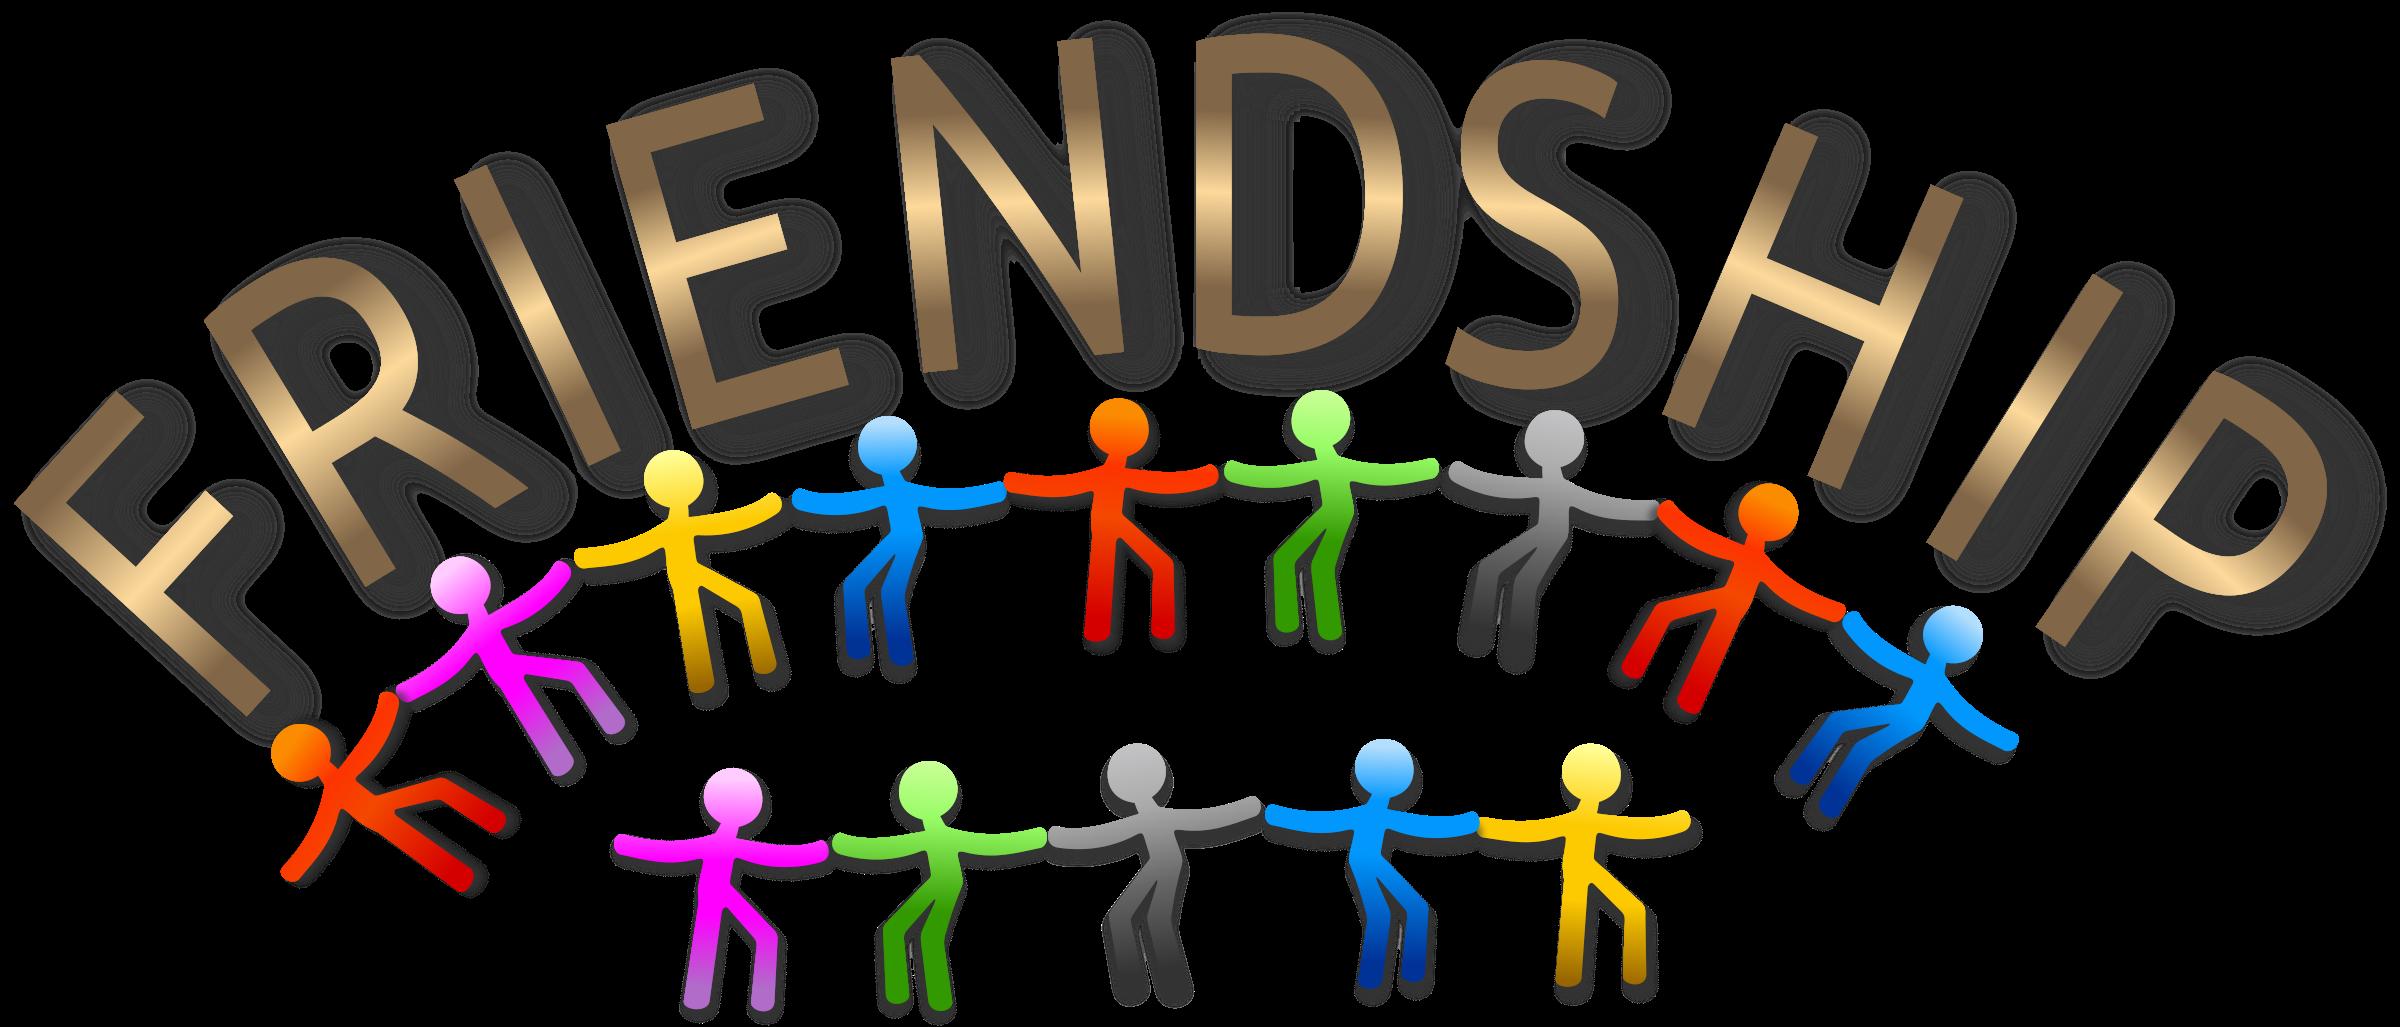 Friendship clipart stick. Big image png